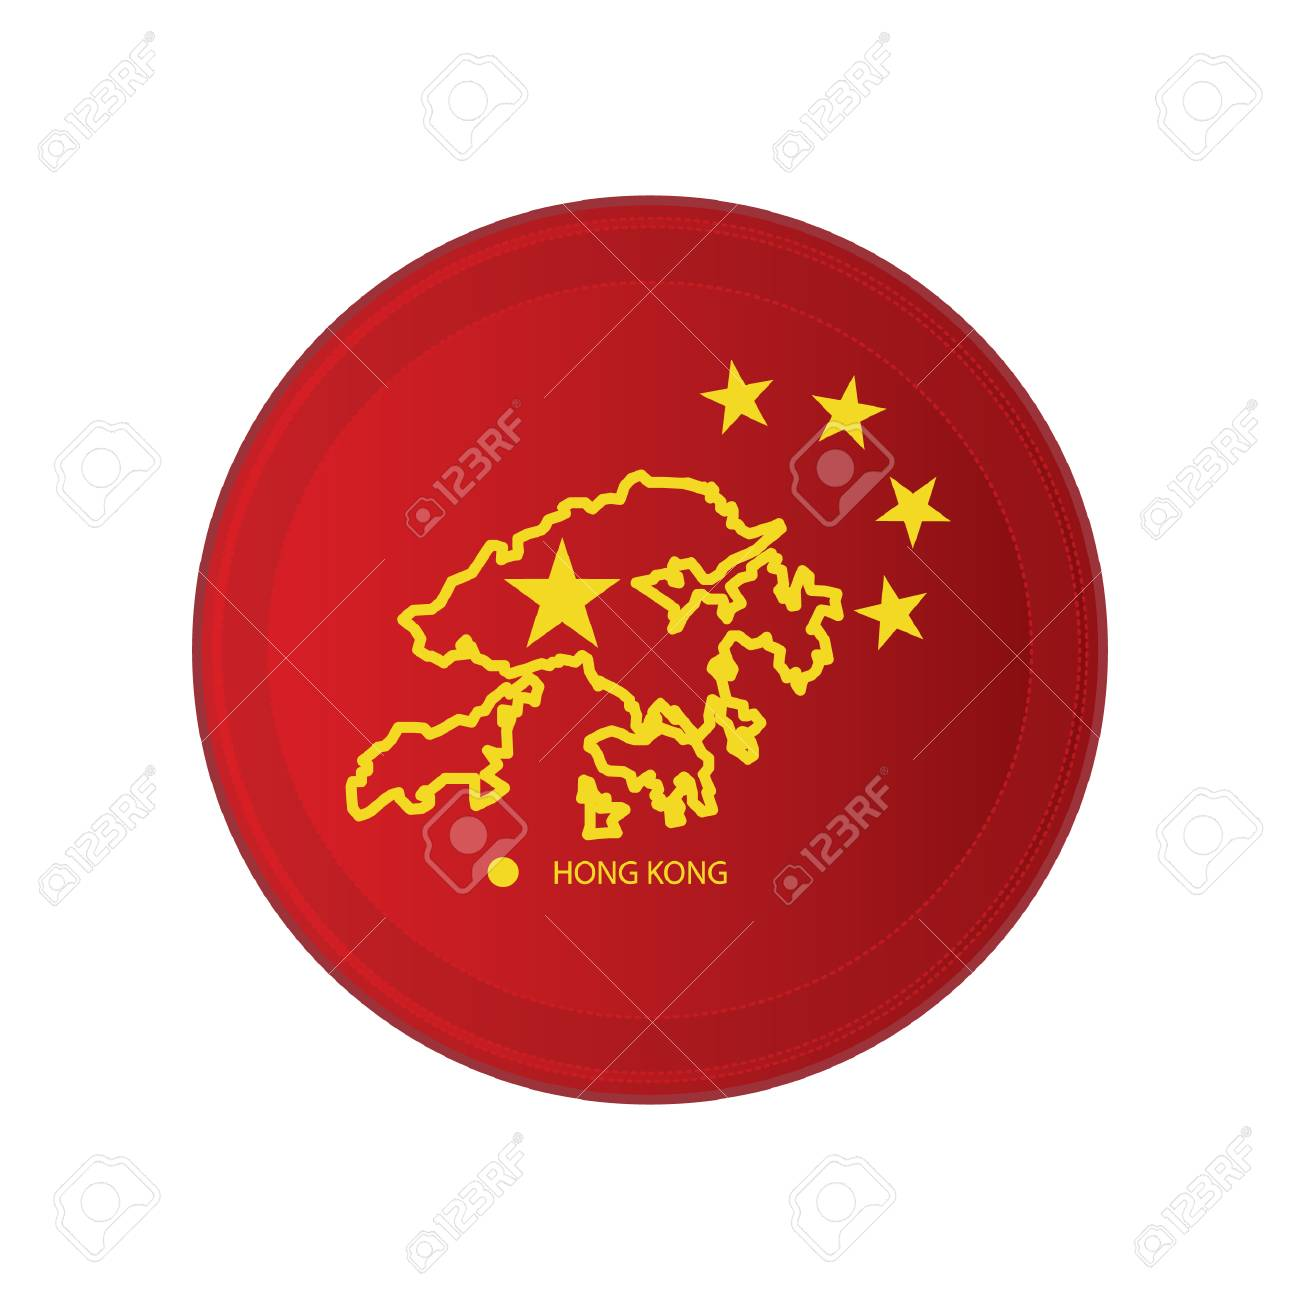 hongkong map - 106669663